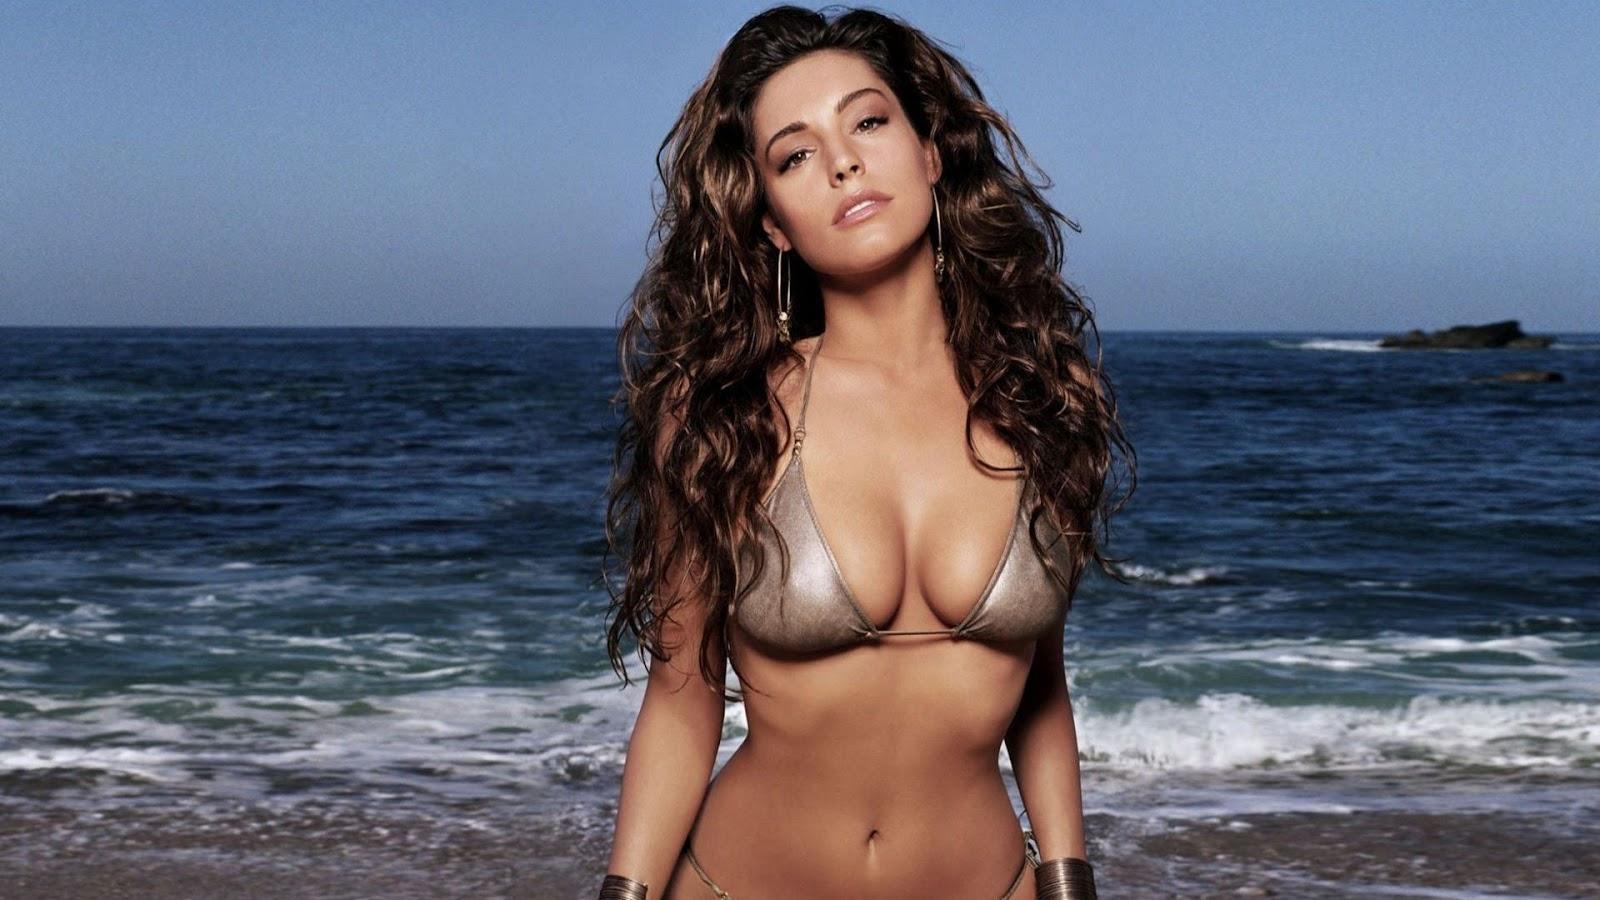 Free pictures gorgeous women in bikini